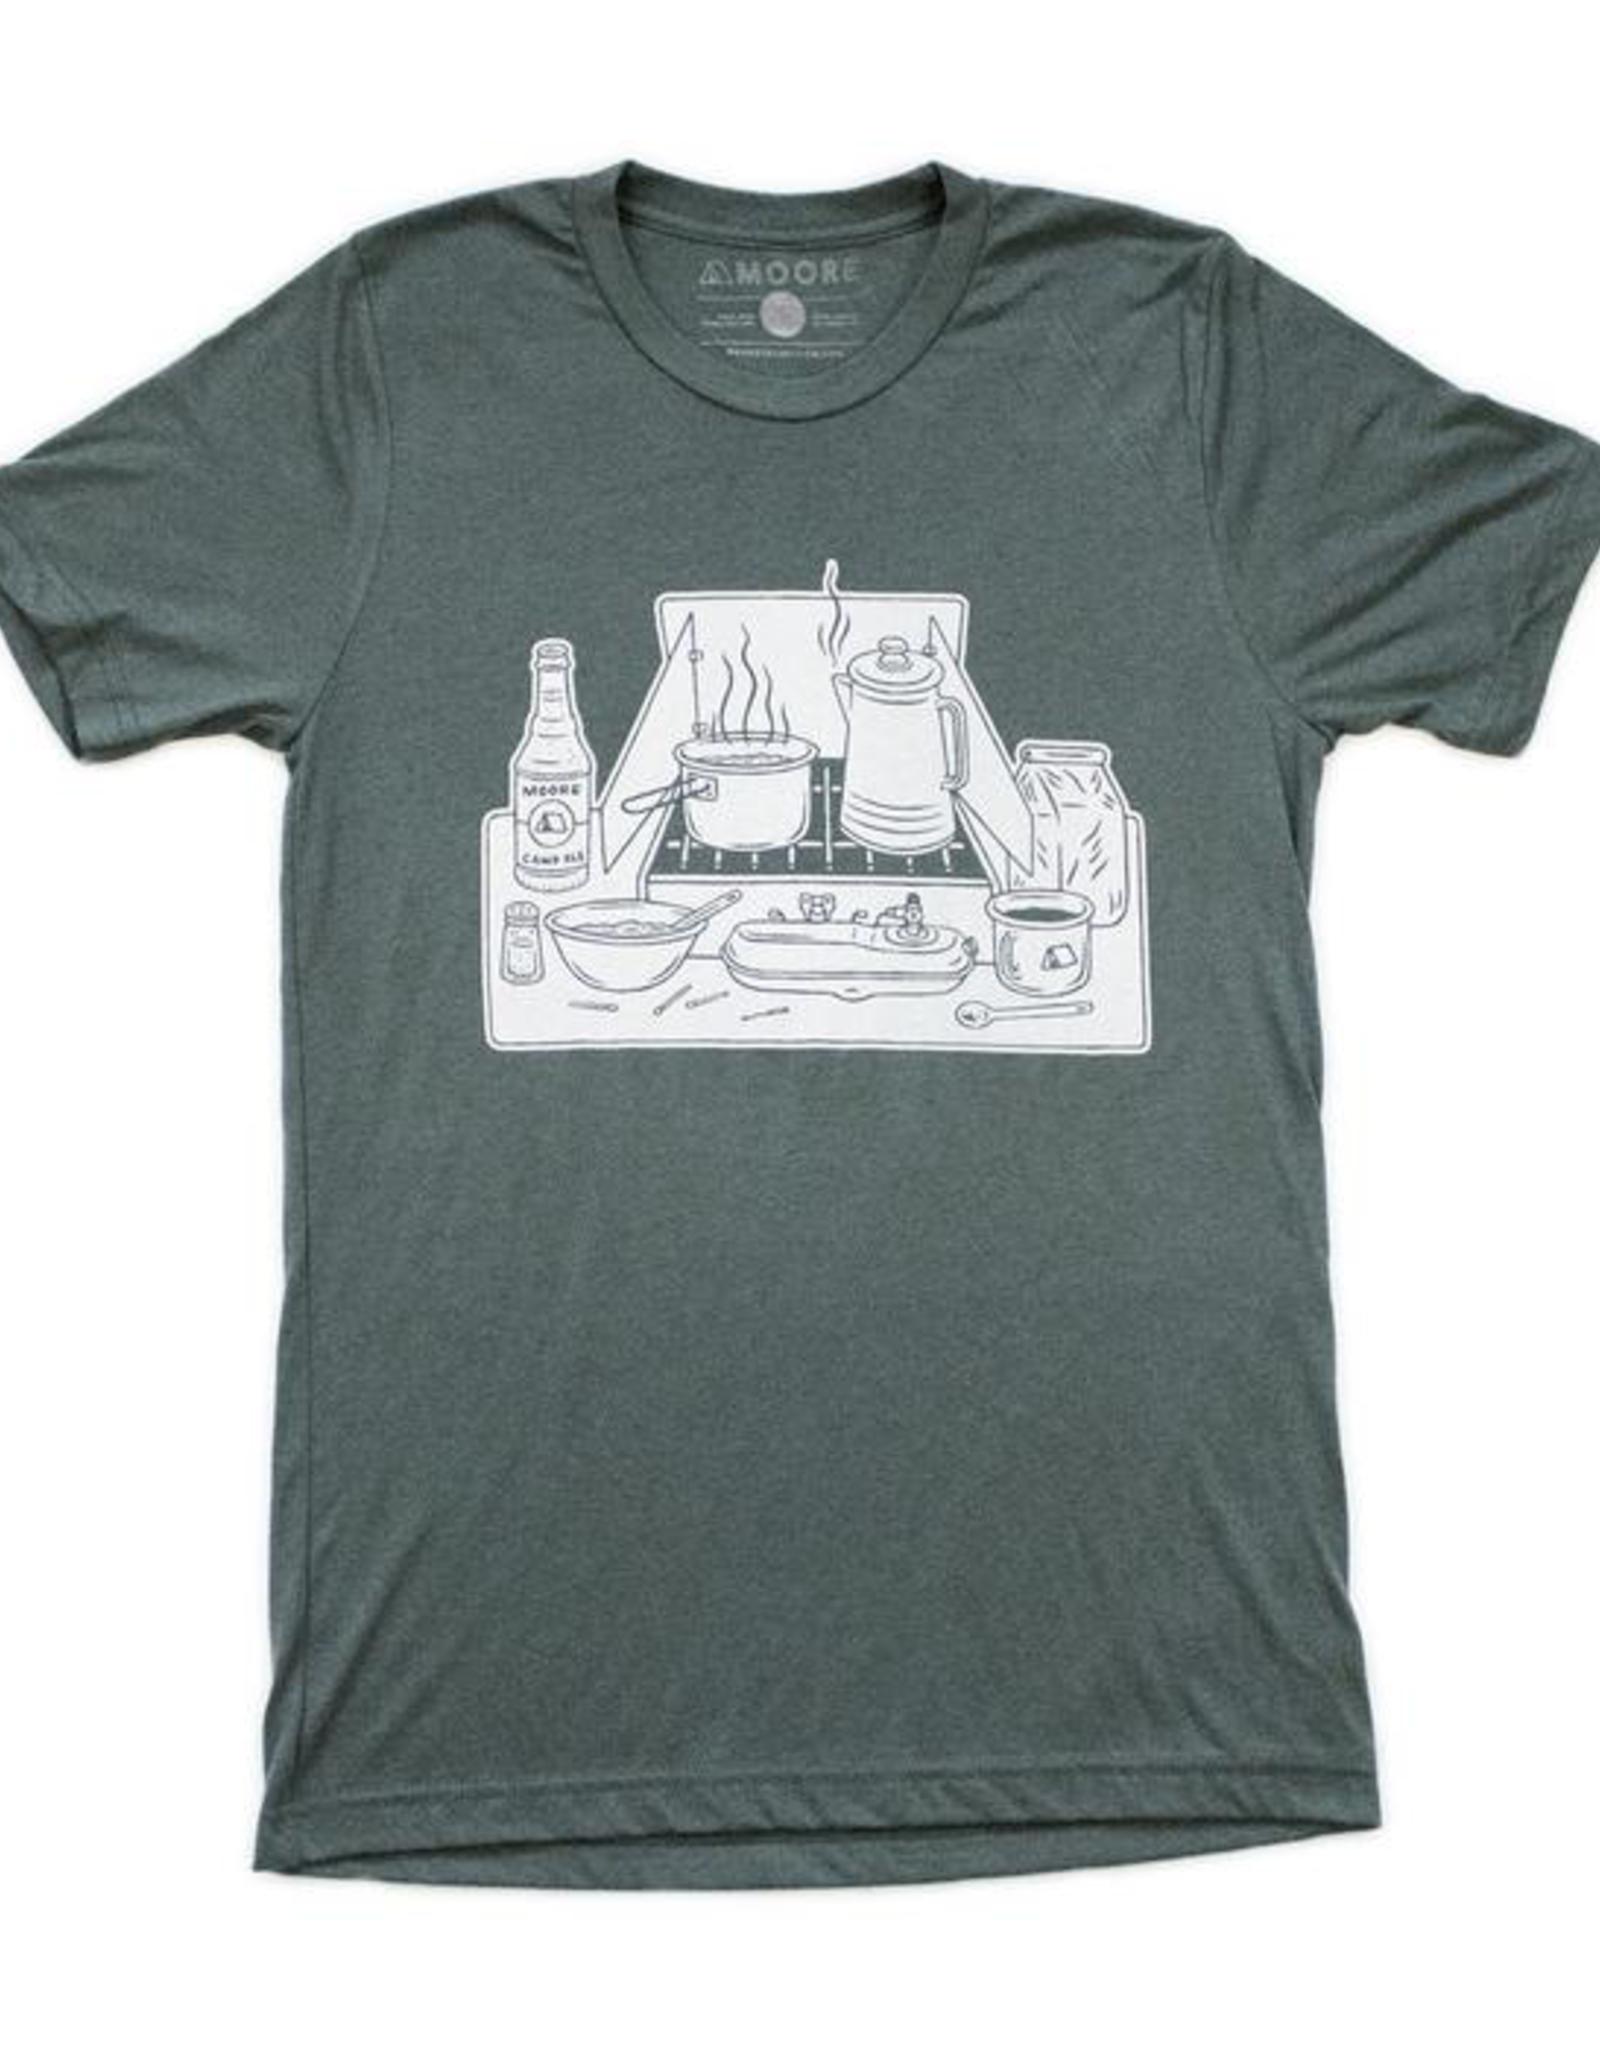 Stove Tshirt